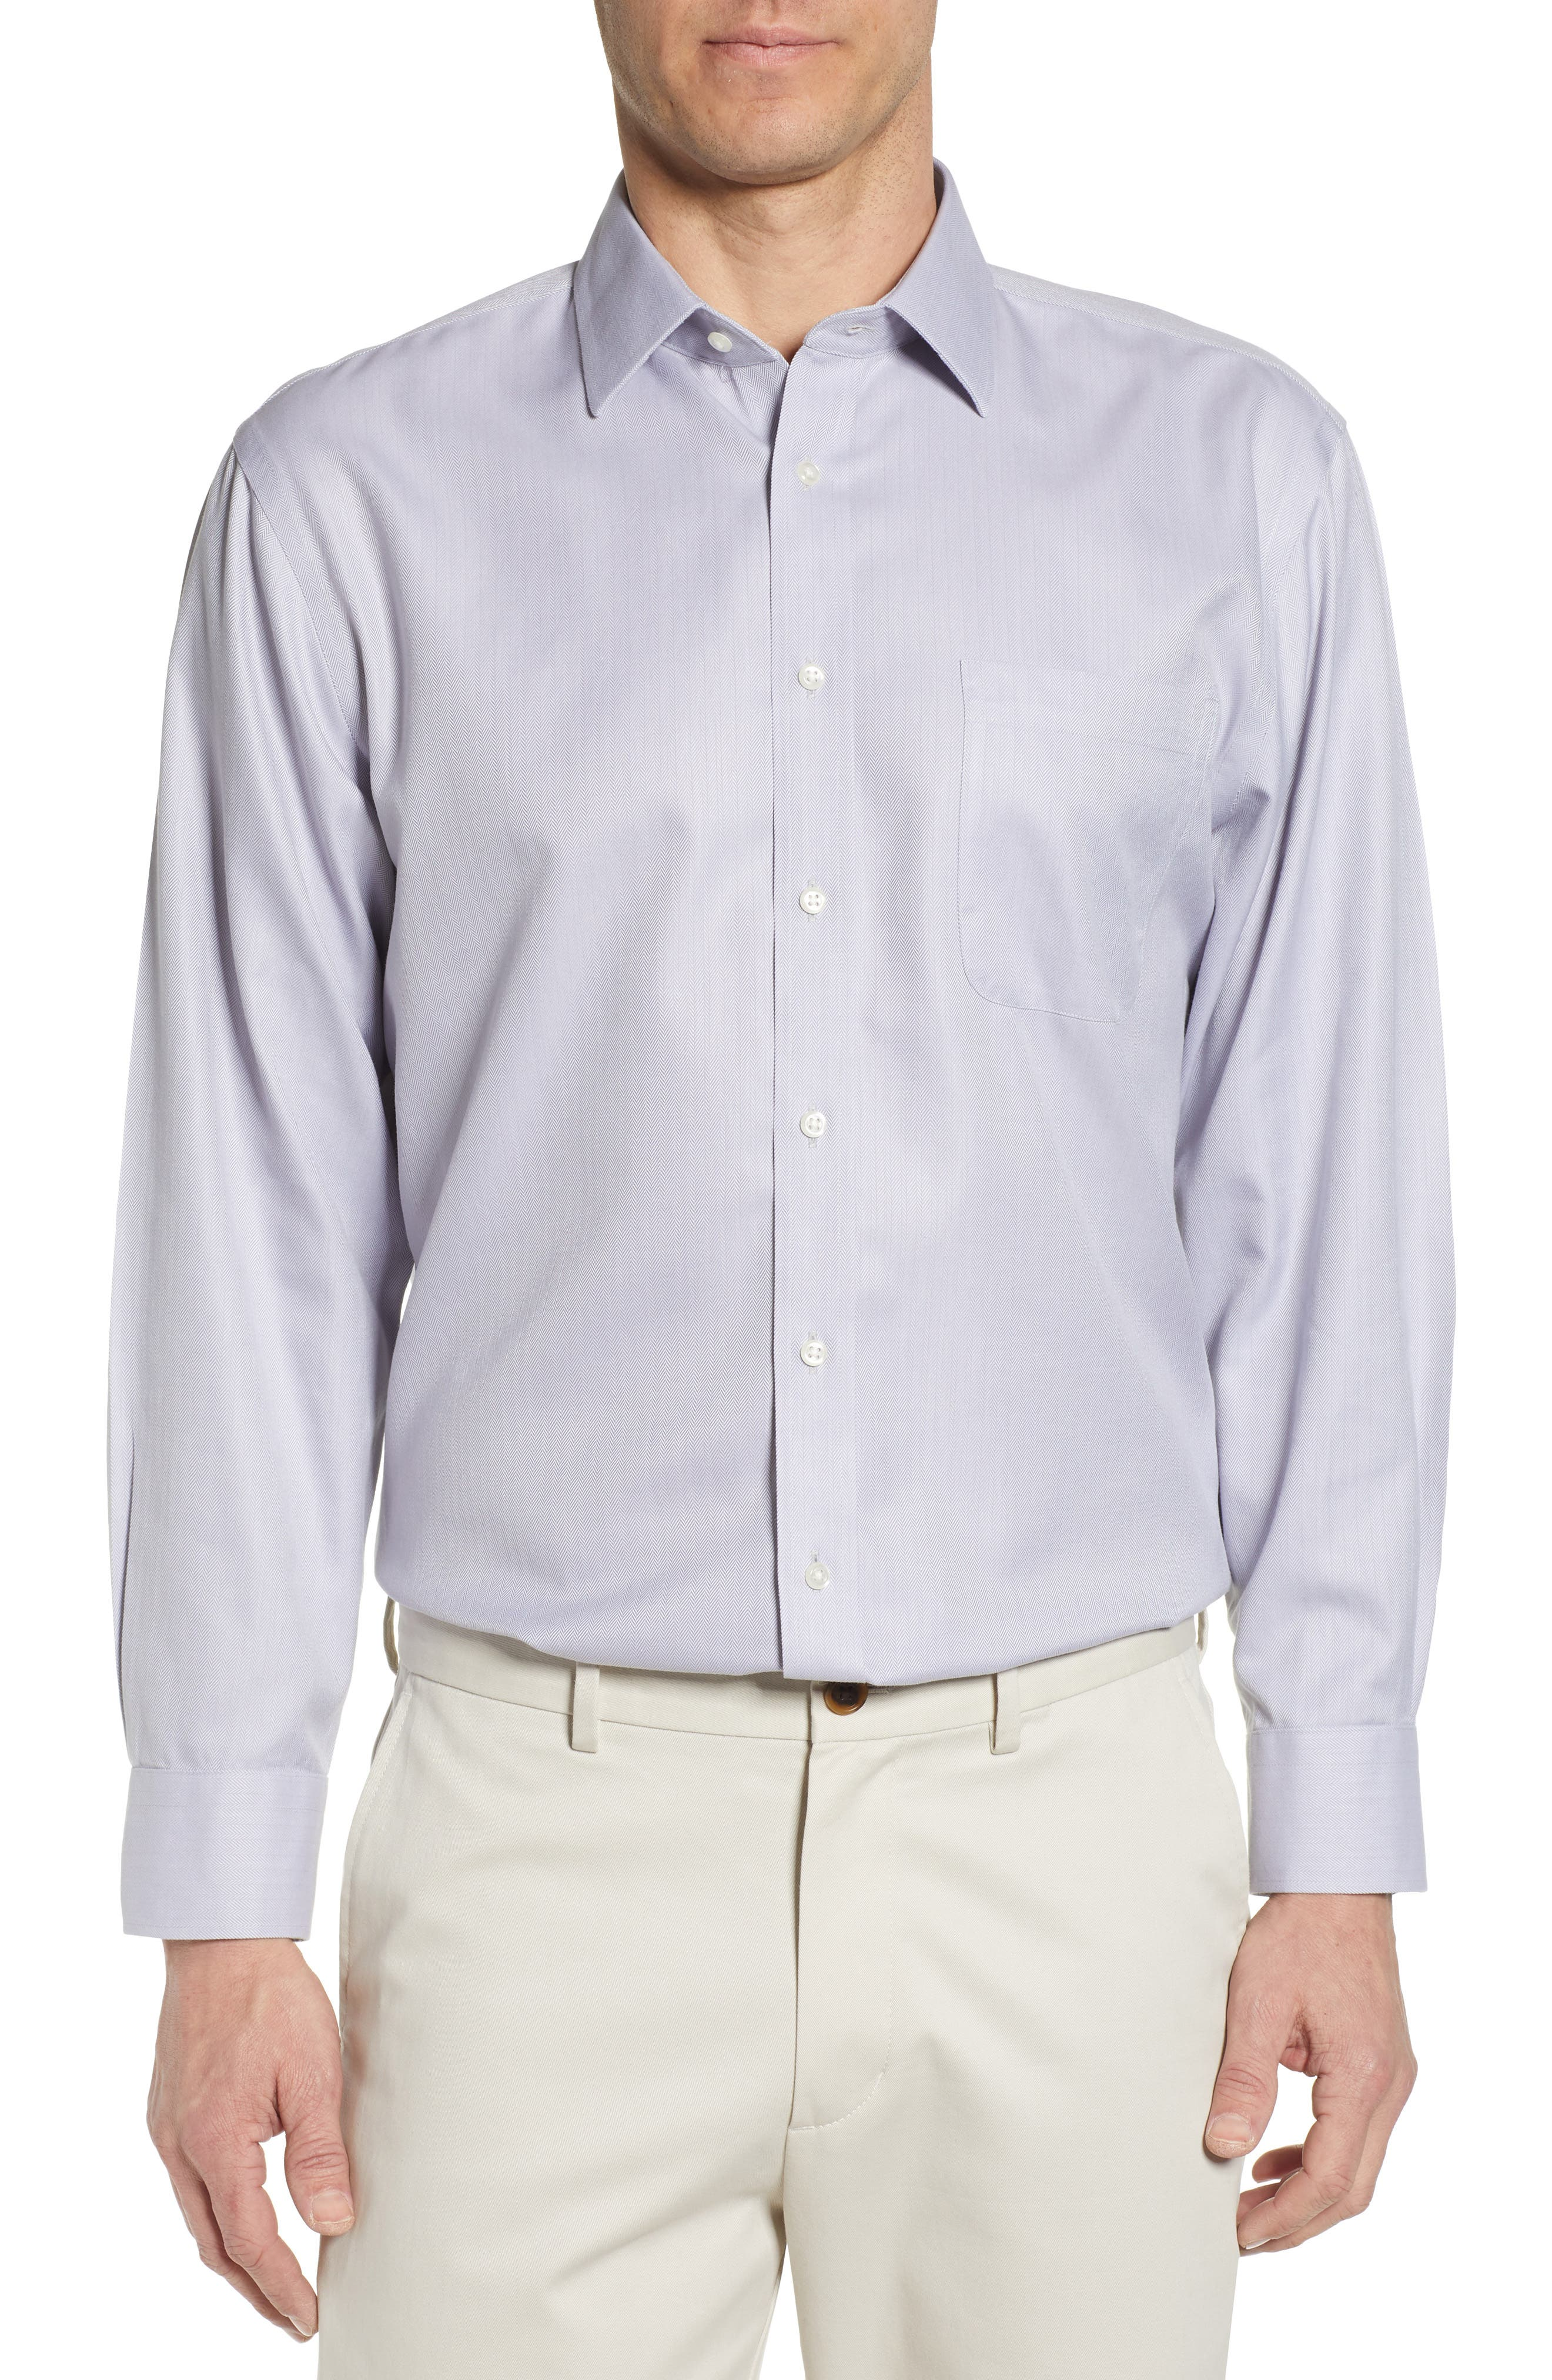 Nordstrom Shop Smartcare(TM) Traditional Fit Herringbone Dress Shirt, Grey